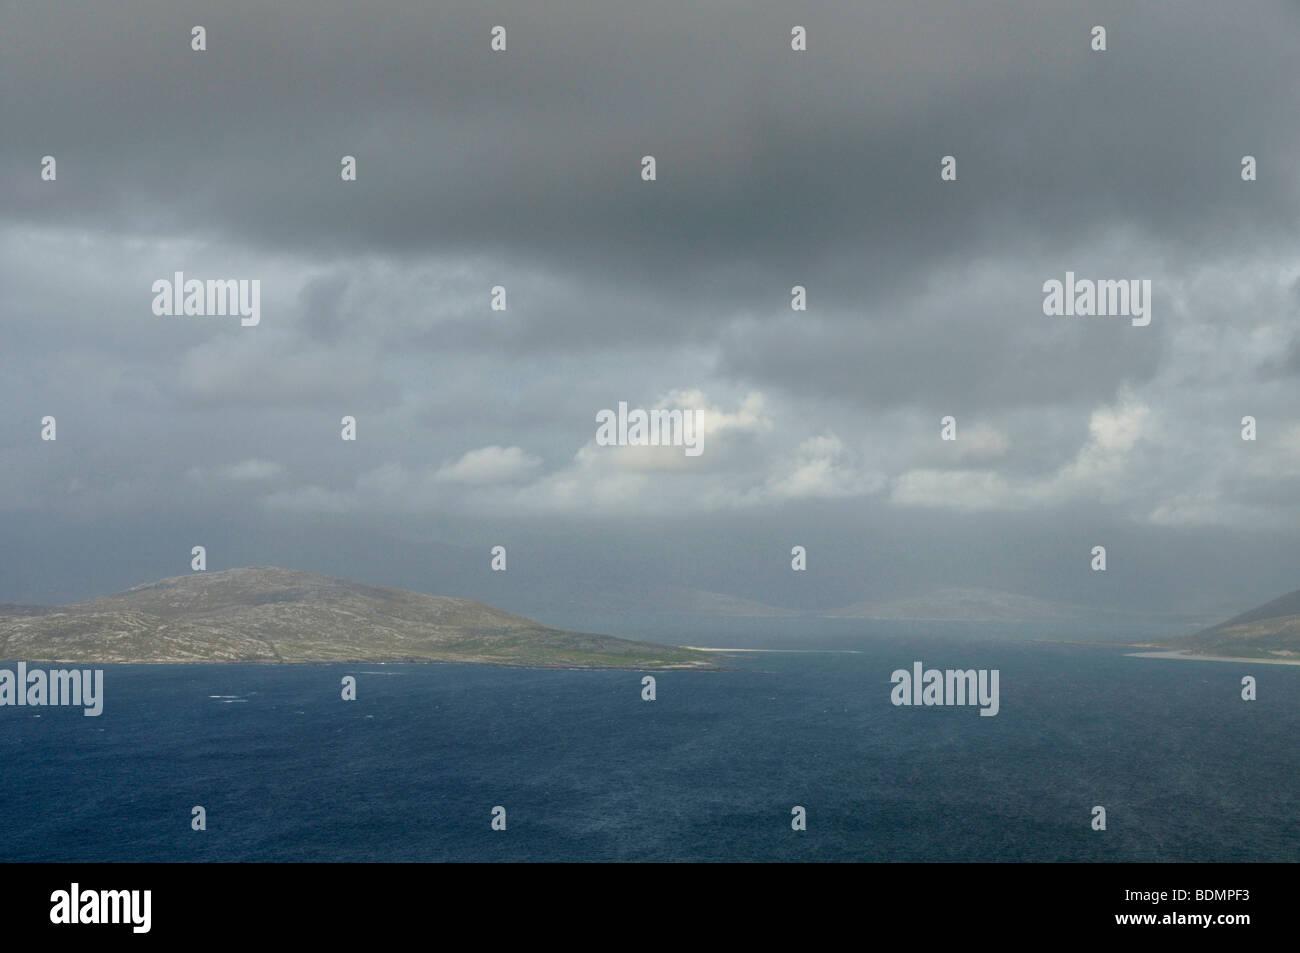 Taransay from Ceapabhal, Isle of Harris, Scotland - Stock Image